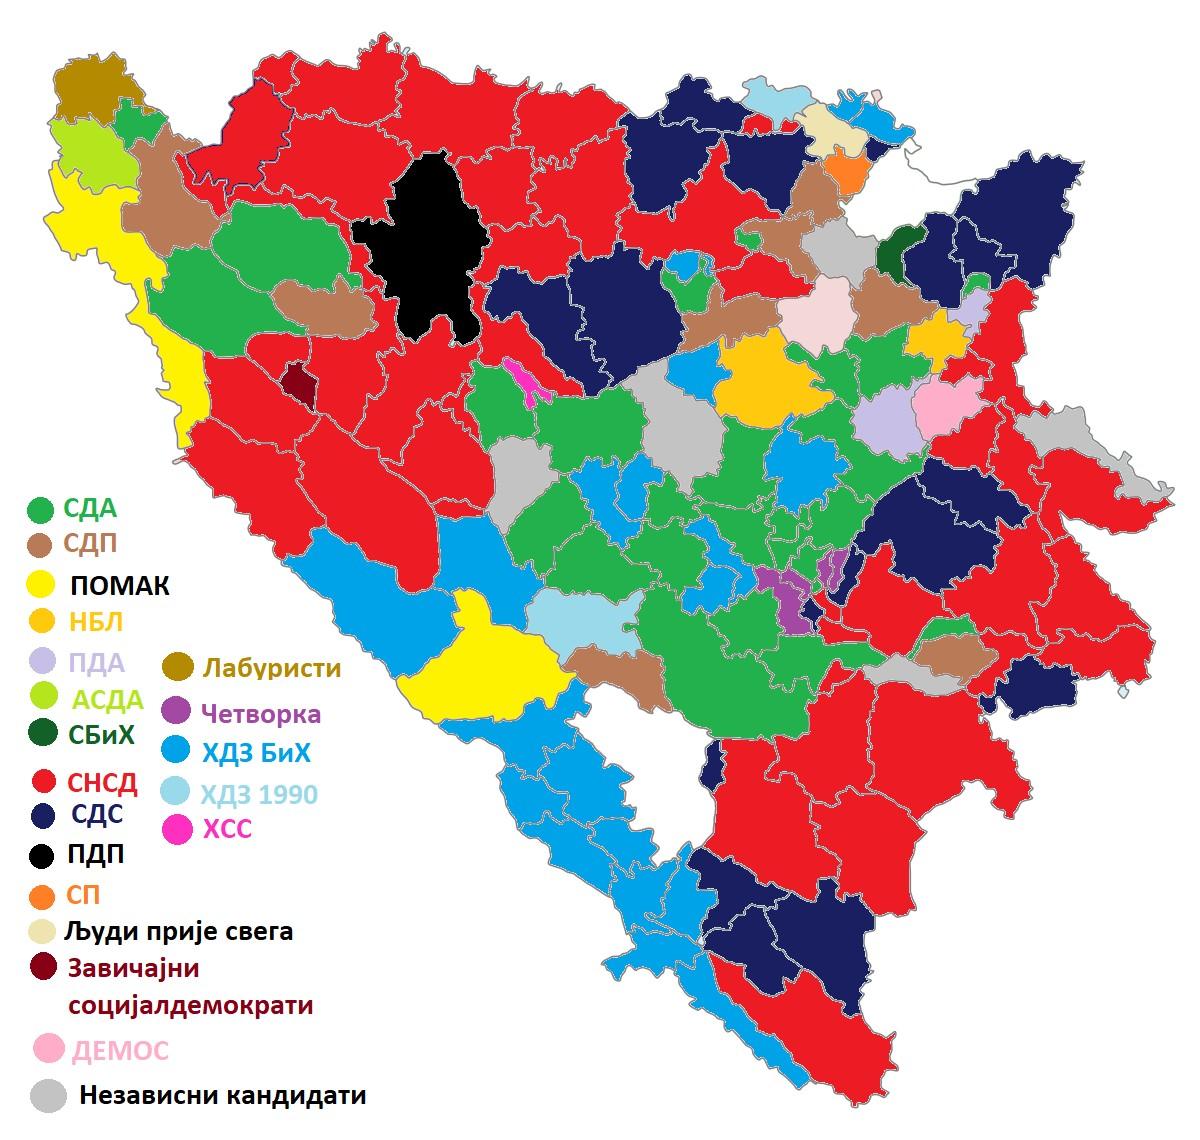 Интерактивна мапа БиХ на основу изборних резултата 2020. (Илустрација: Рајко Петровић/Нови Стандард)